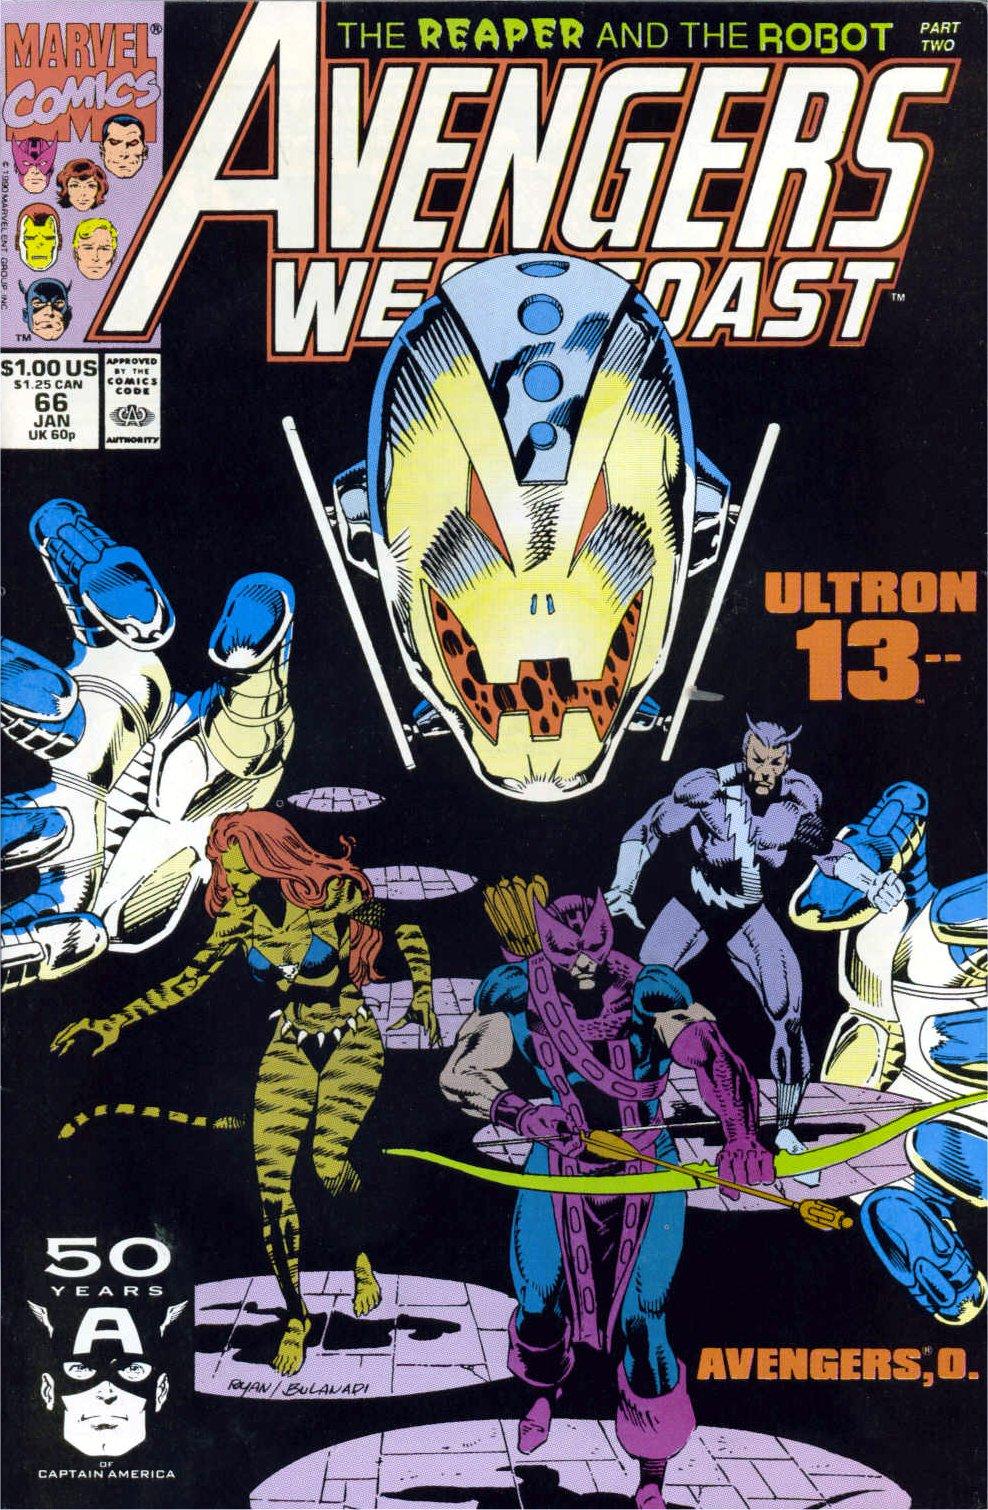 Avengers West Coast (1989) 66 Page 1